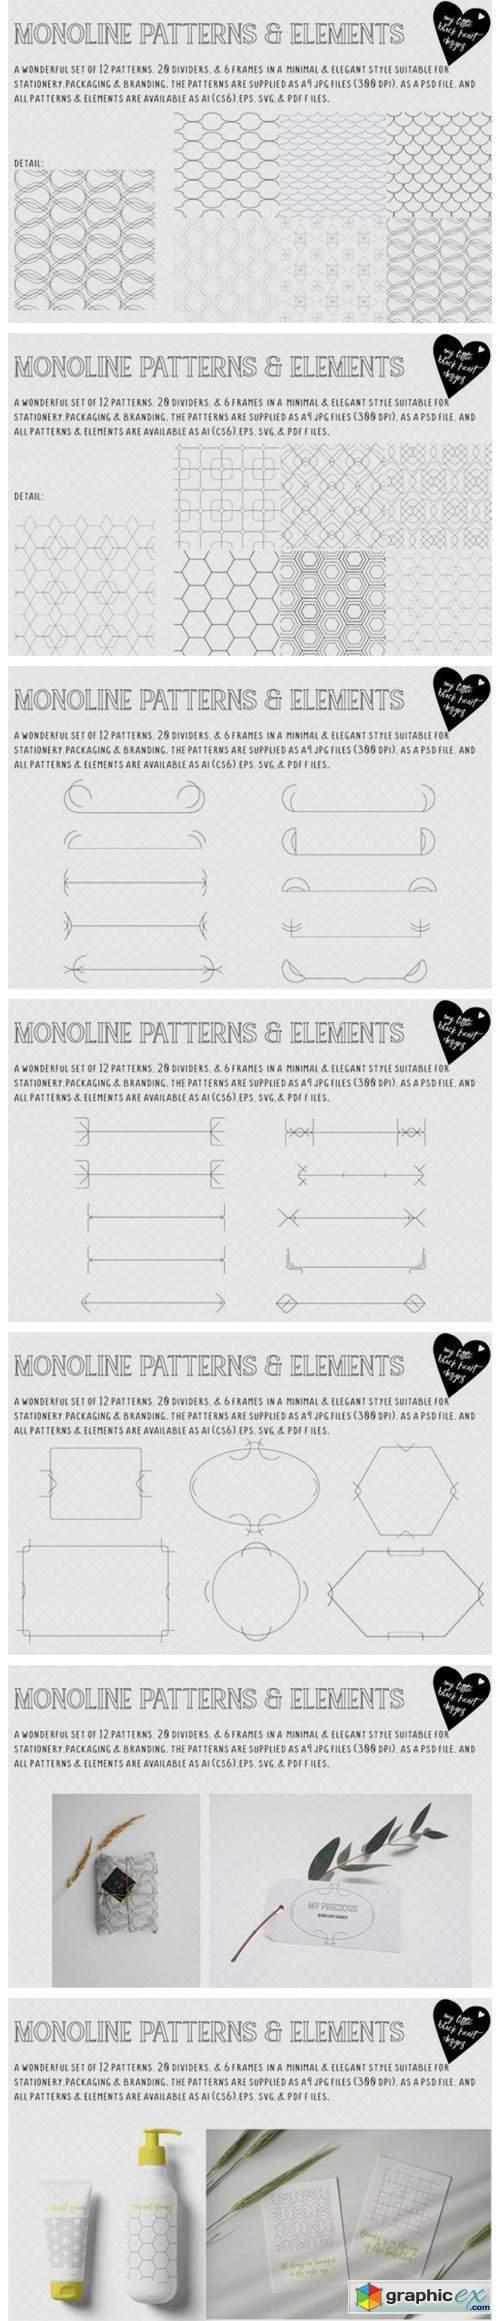 Monoline Patterns & Elements